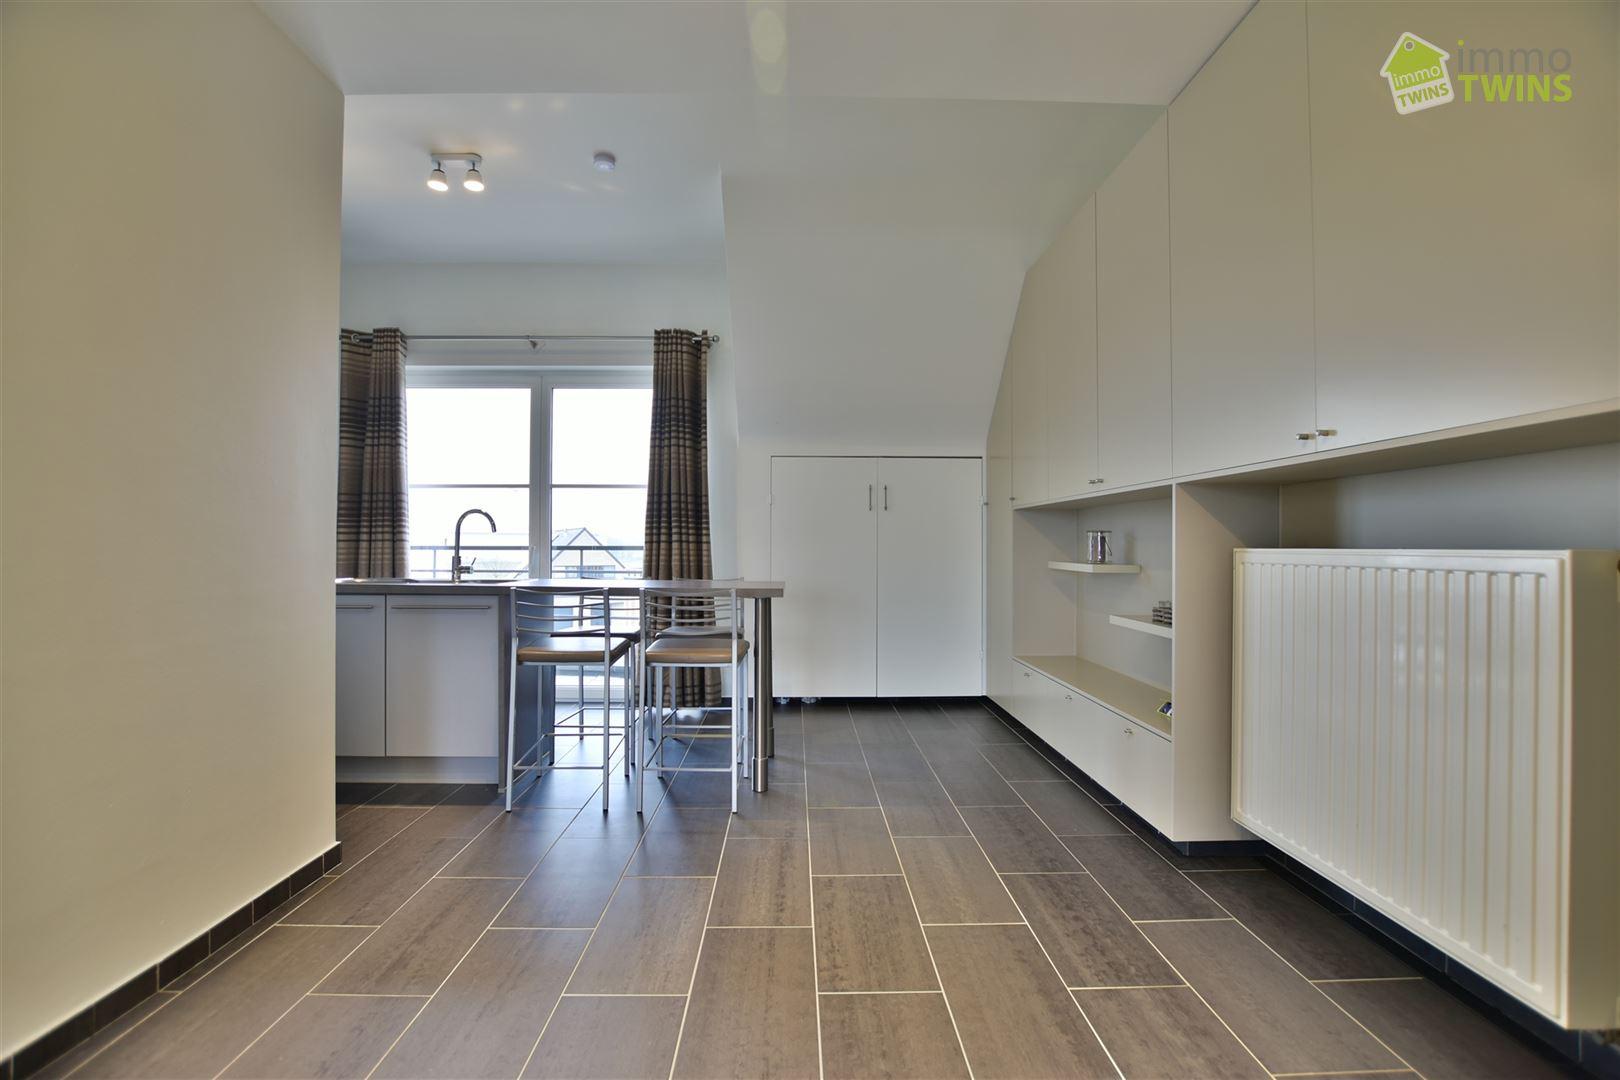 Foto 8 : Appartement te 9200 BAASRODE (België) - Prijs € 650